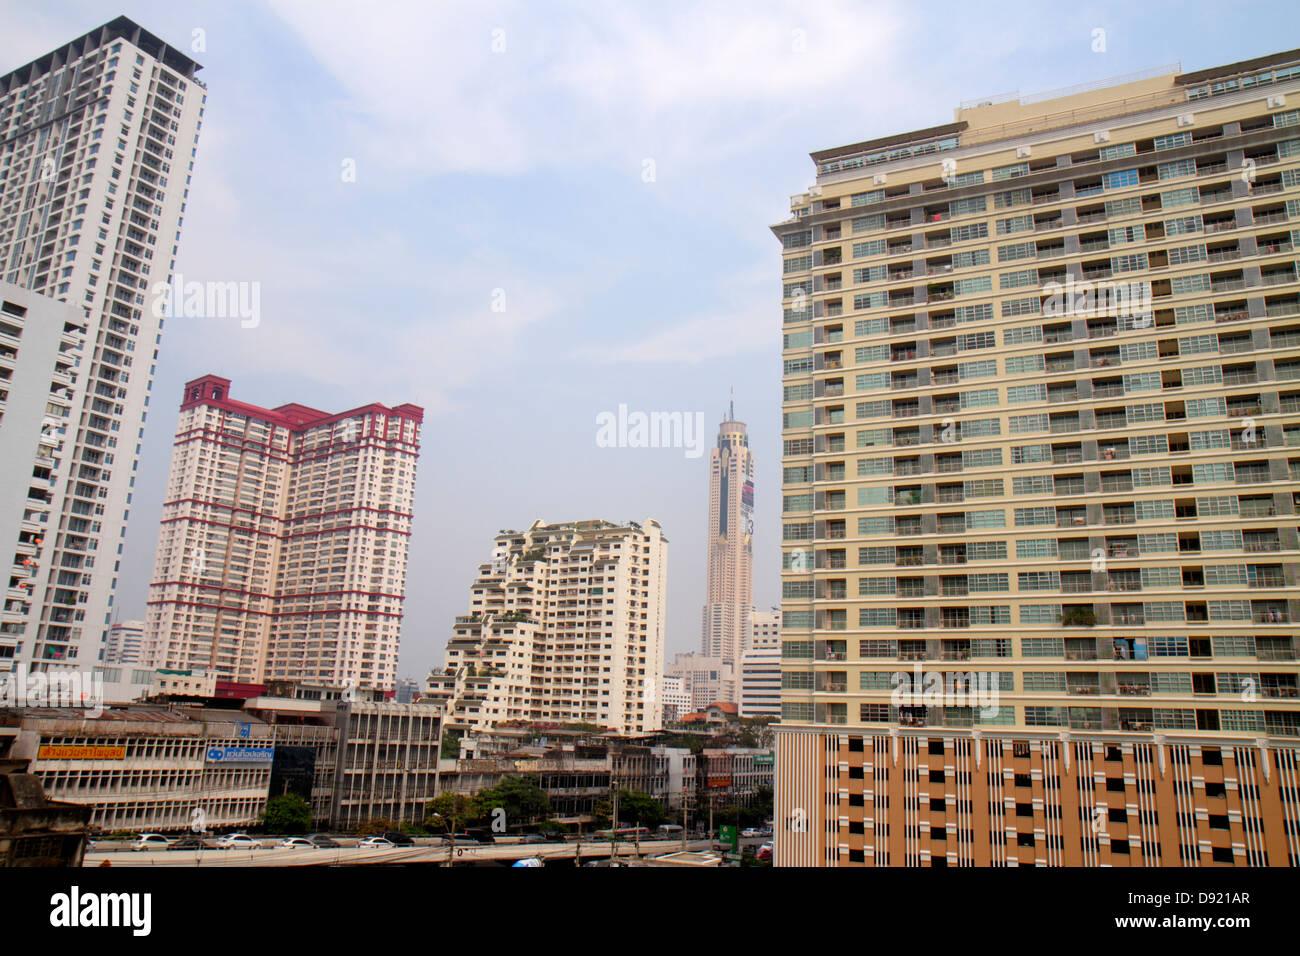 Bangkok Thailand Ratchathewi Hochhaus Eigentumswohnanlage Wohn Baiyoke Tower II Hotel Hochhaus Stockbild